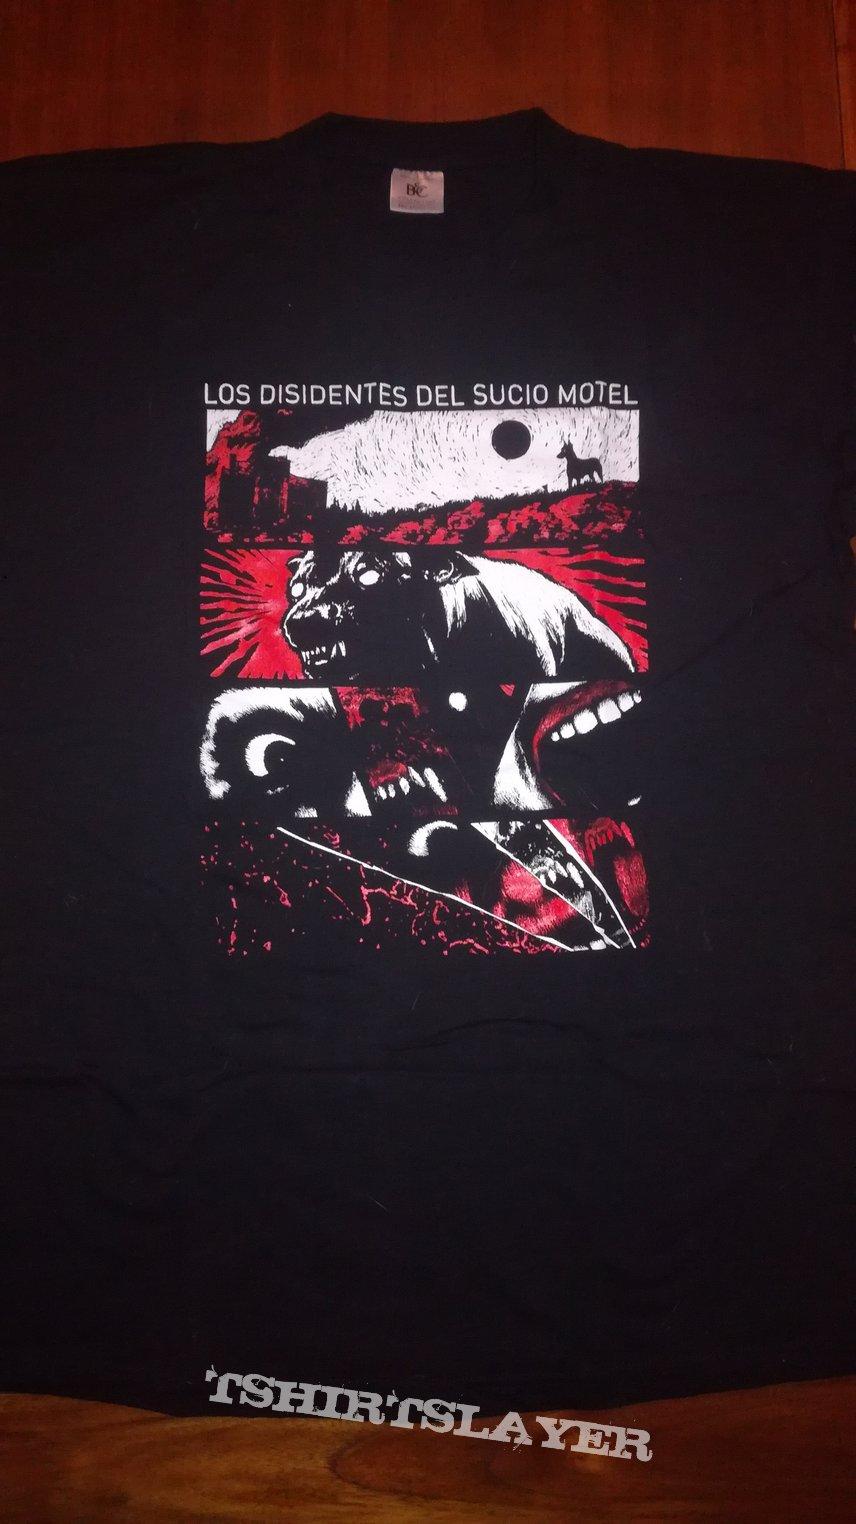 Los Disidentes Del Sucio Motel - 2018 tour shirt